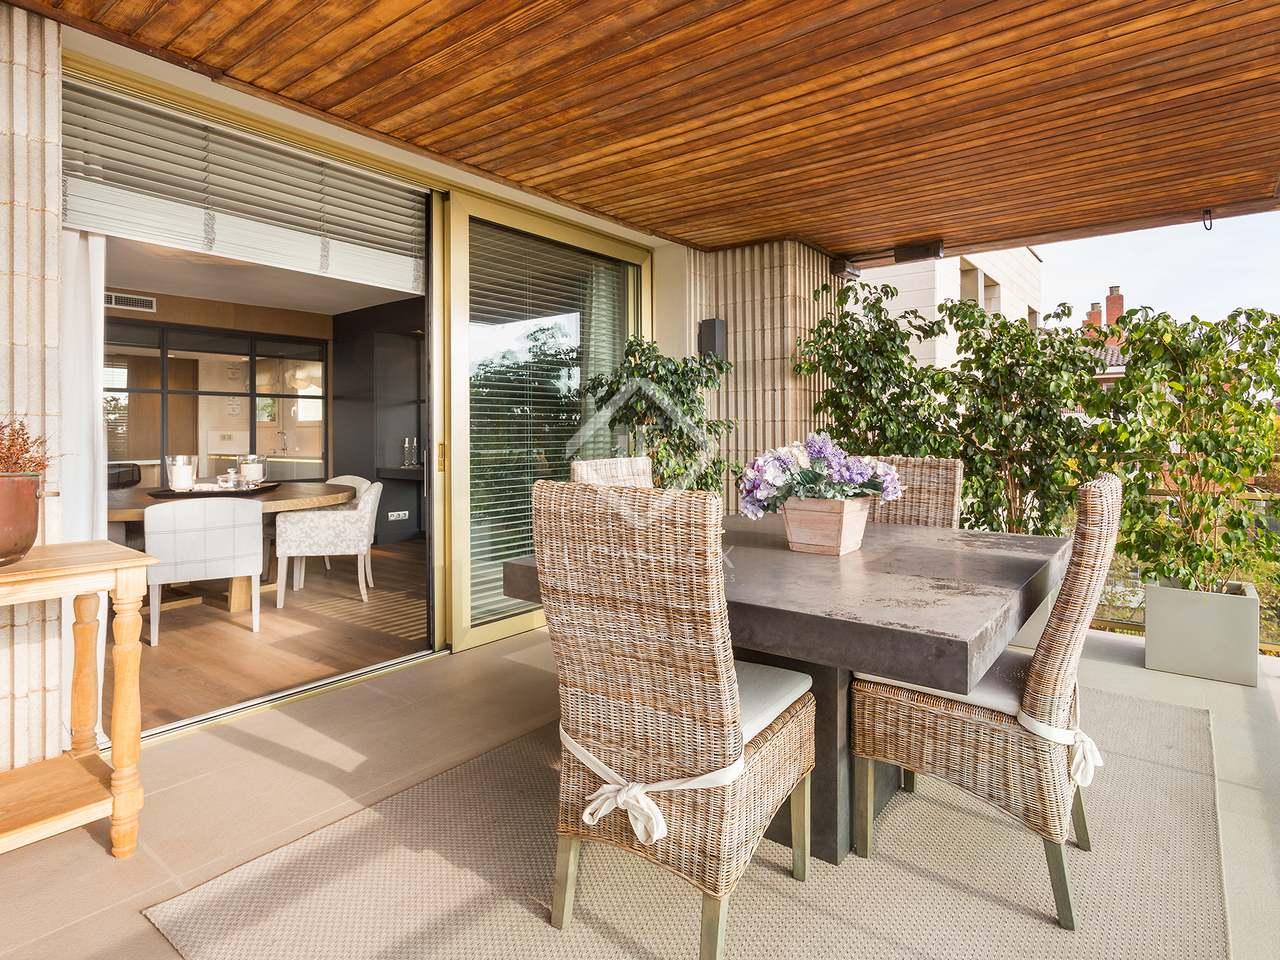 Tico d plex con 140m de terraza en venta en tres torres for Terrazas 1280 a